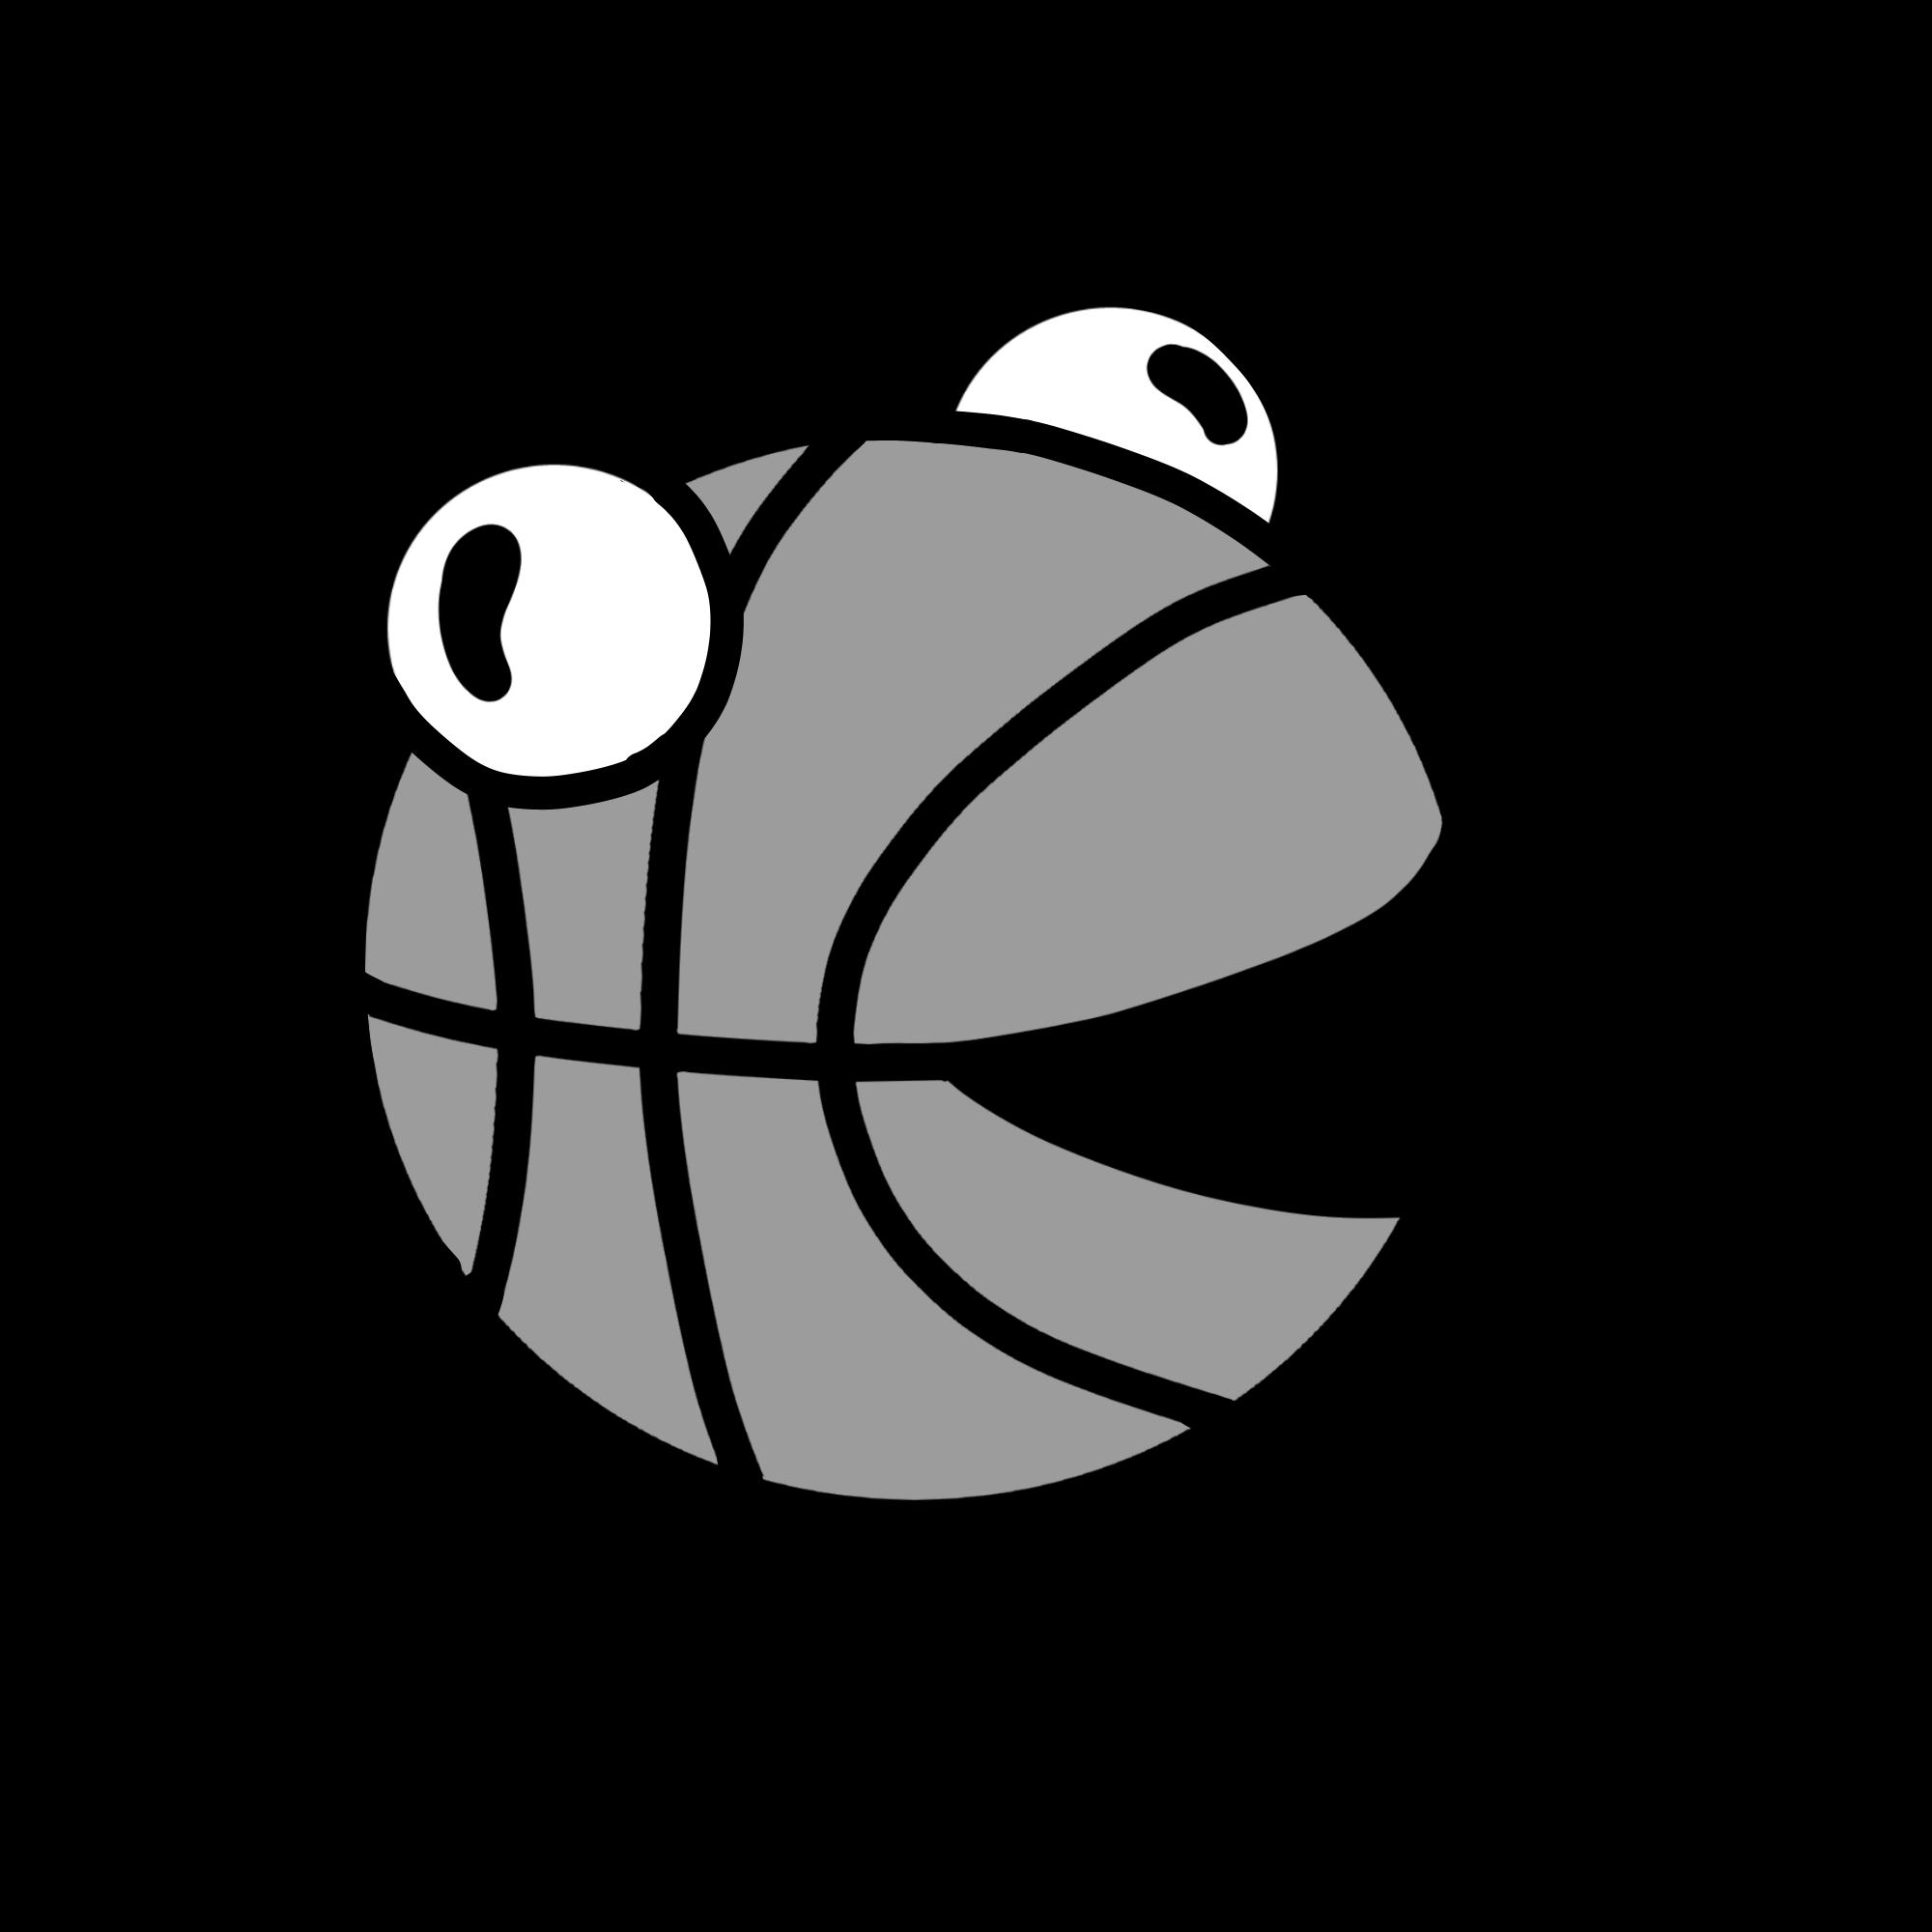 Penaltyshout.basketball